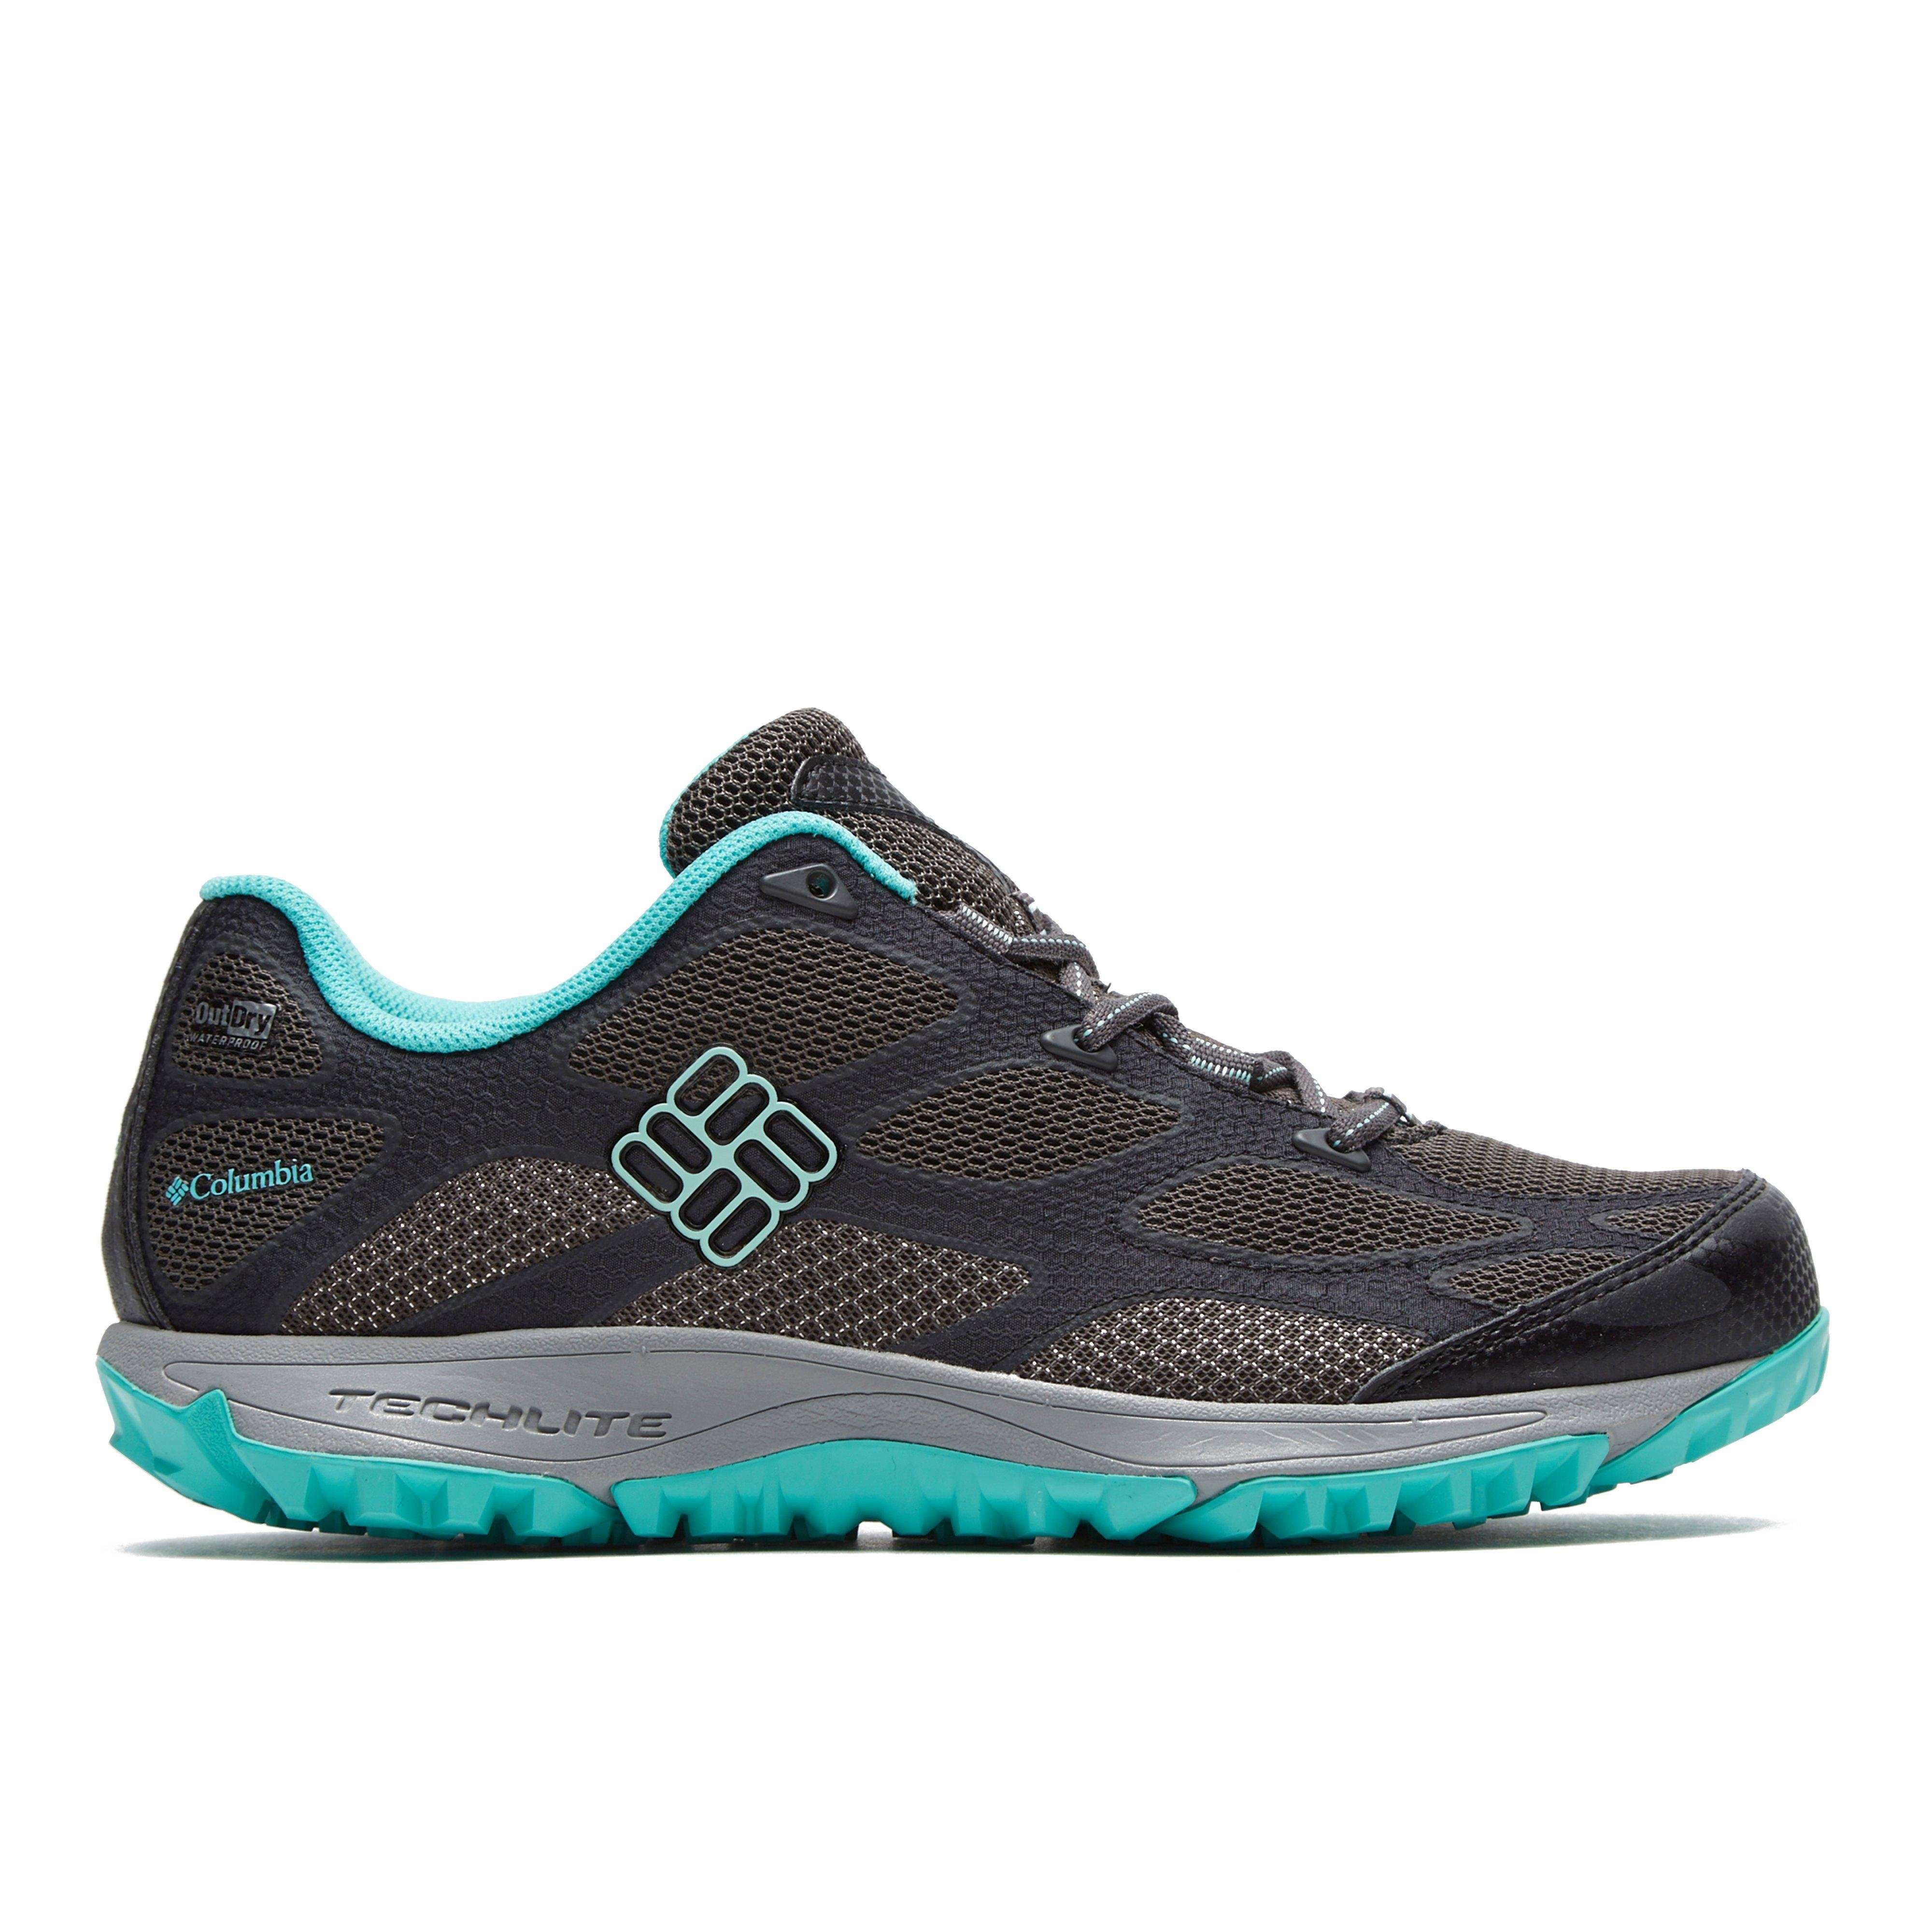 COLUMBIA Women's Conspiracy IV OutDry® Multi-Sport Shoe